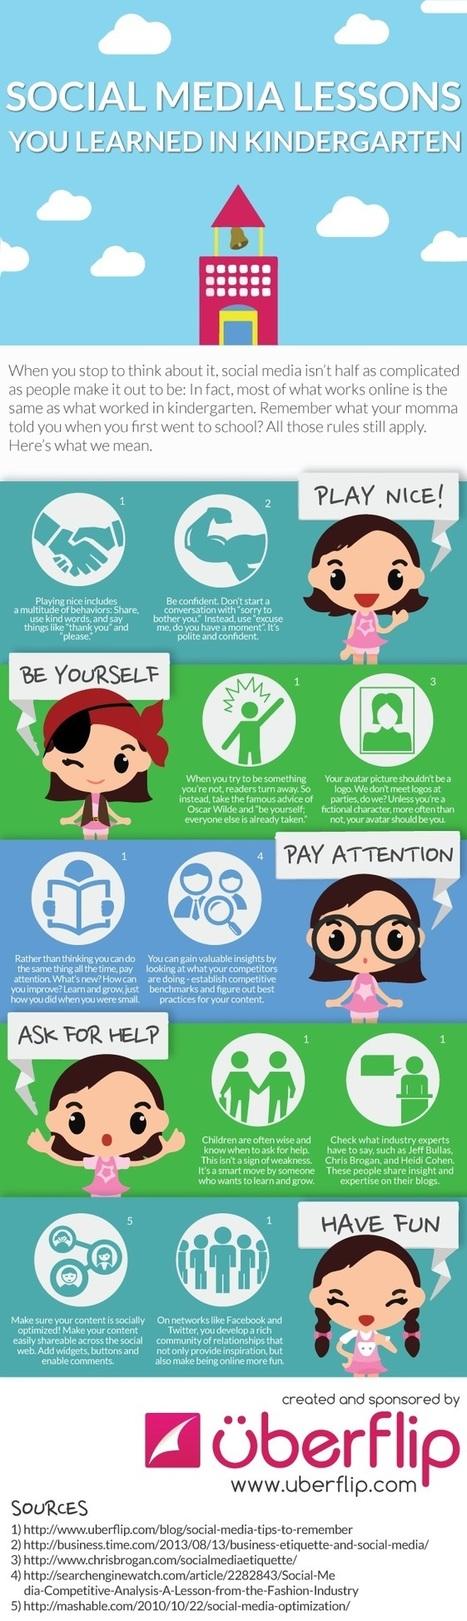 social-media-lessons-you-learned-in-kindergarten-uberflip.jpg (660x2290 pixels) | Social Media by Simply Social Media | Scoop.it